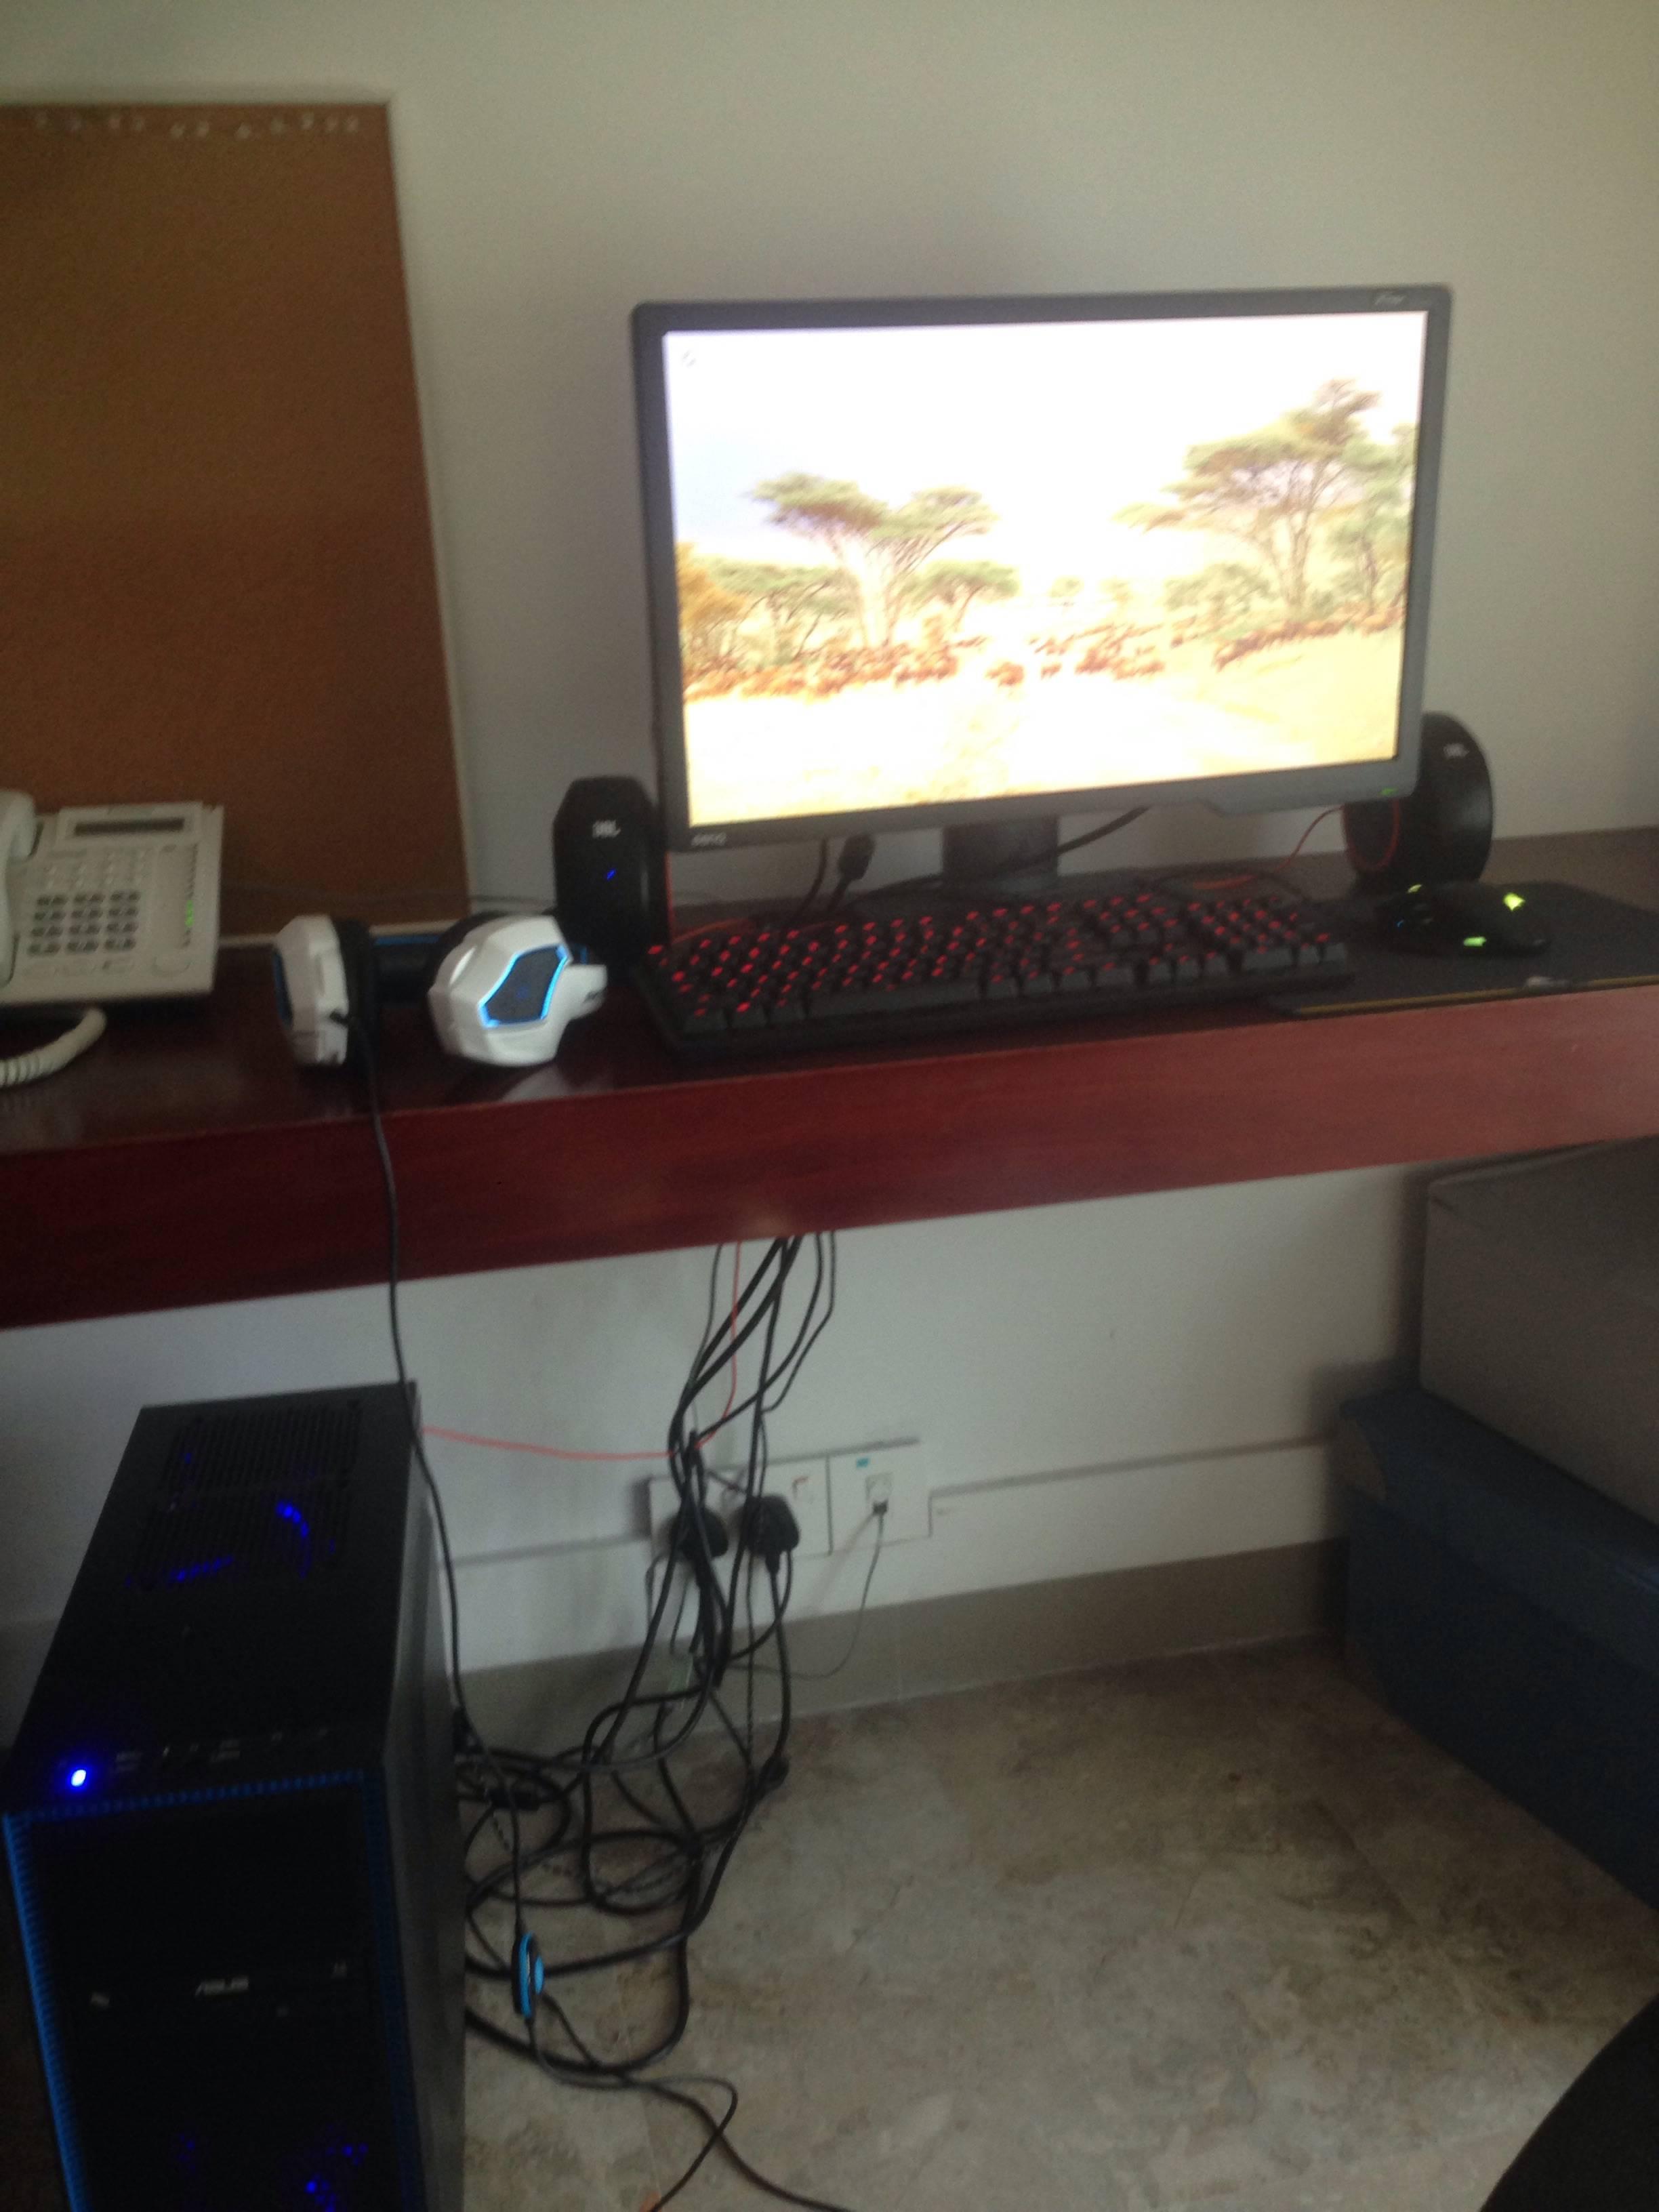 TheMamba's Setup - Idk just a setup | Scooget